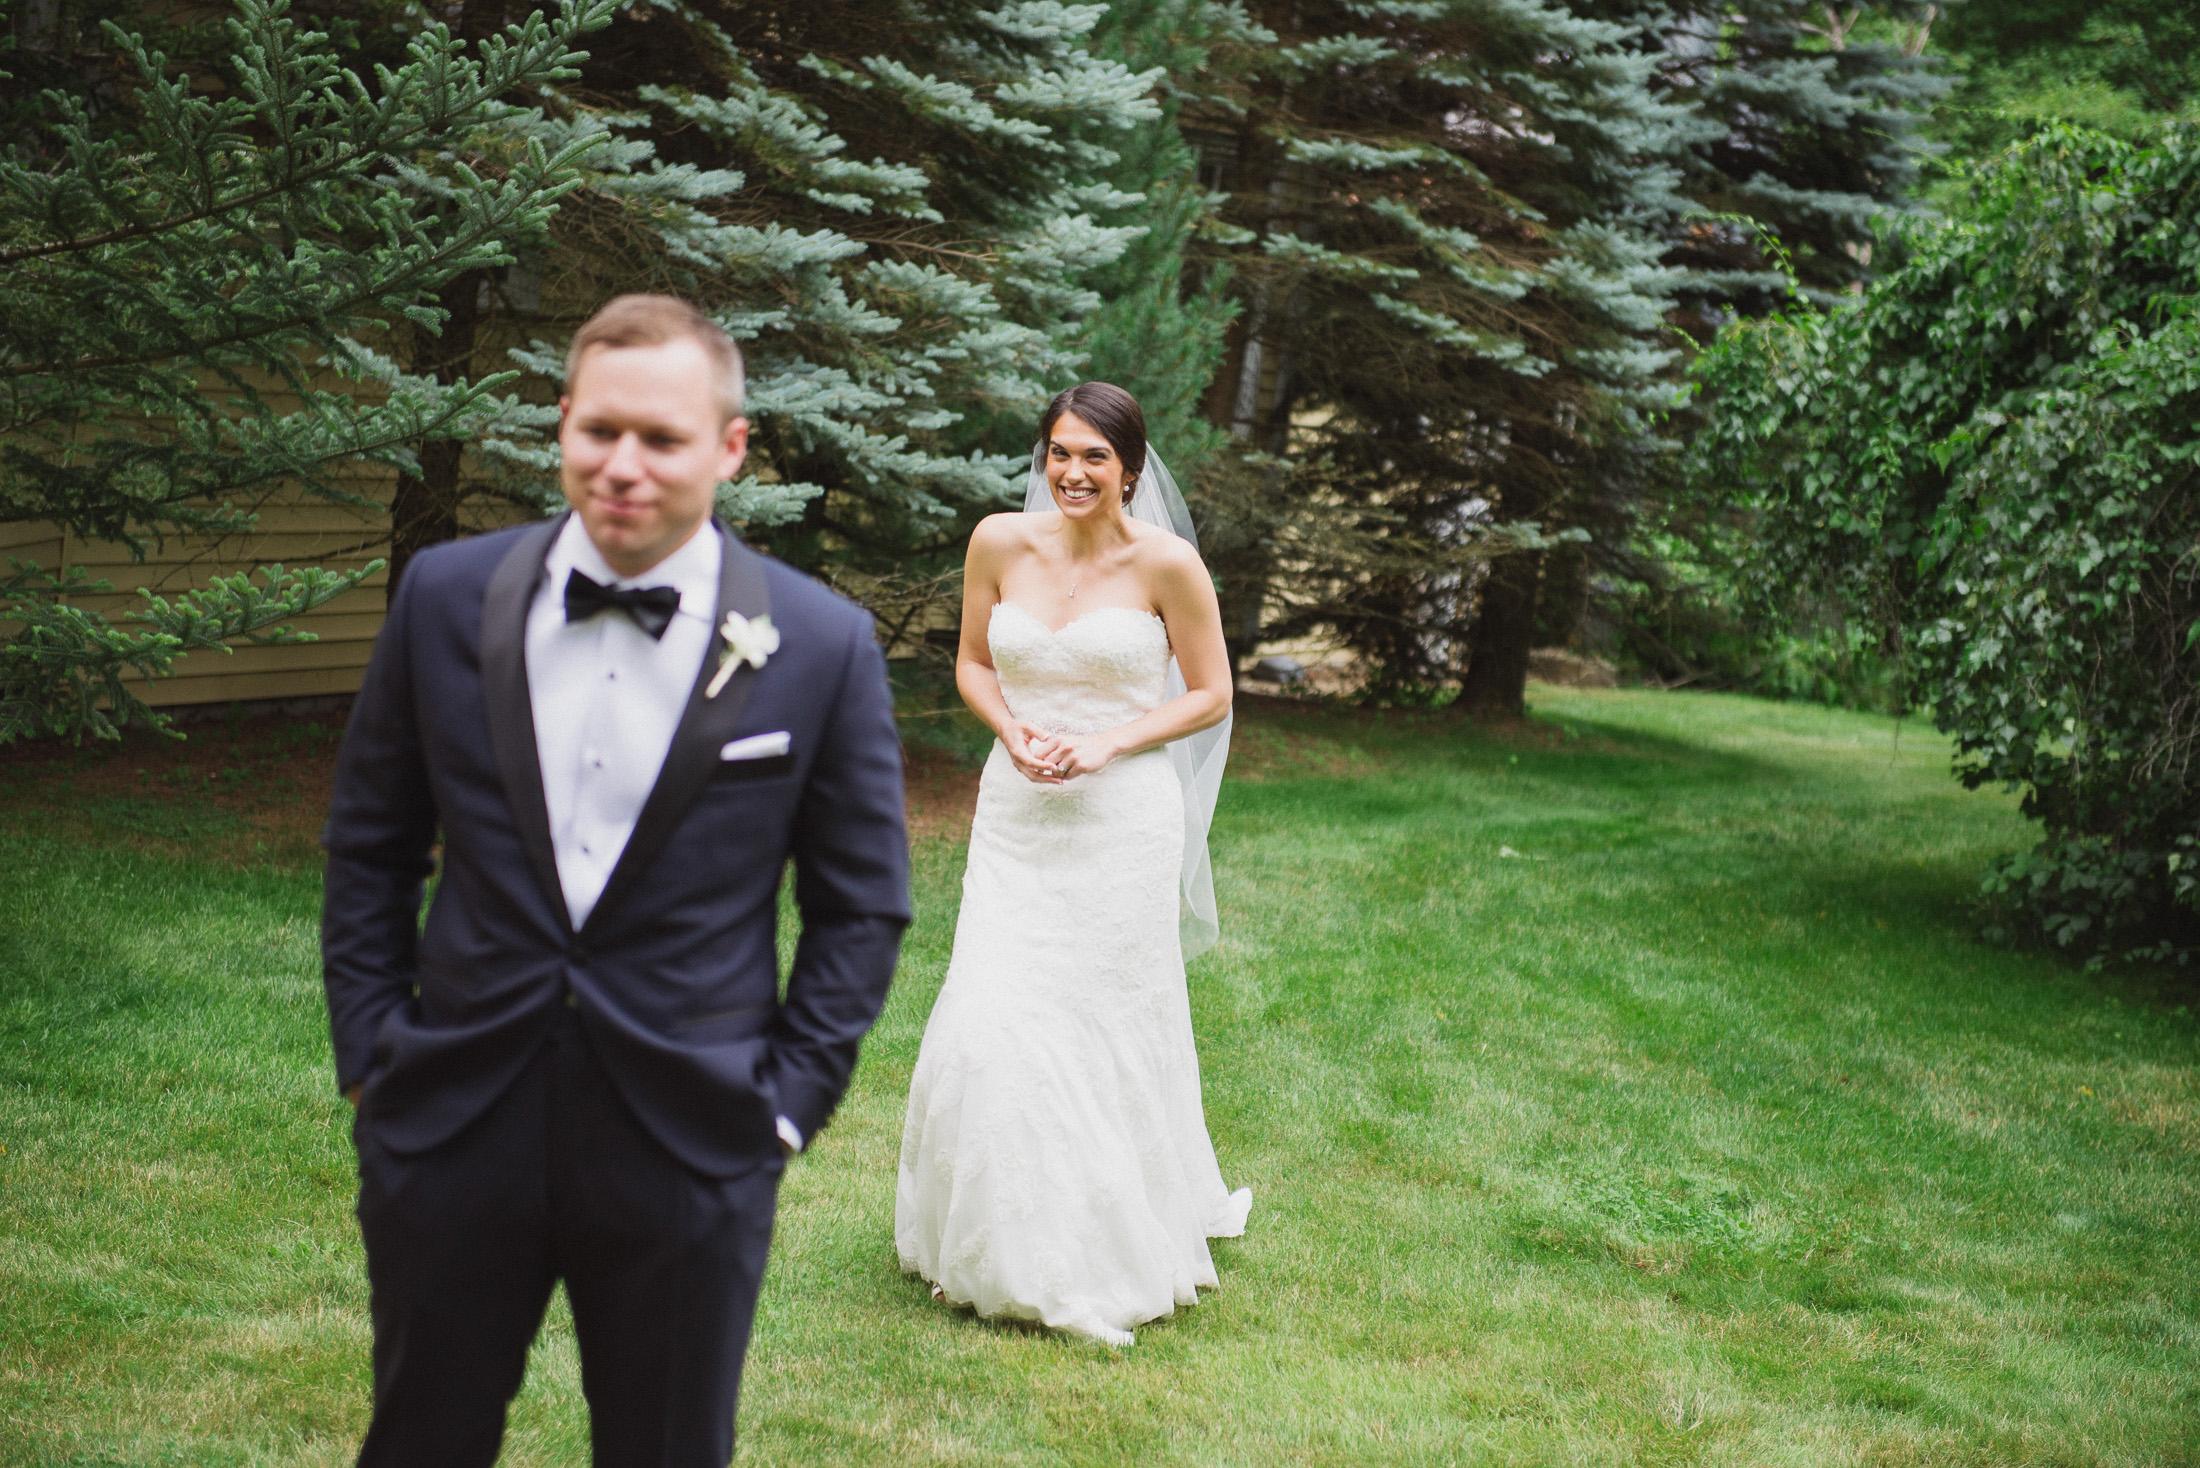 NH Wedding Photographer: first look at BVI